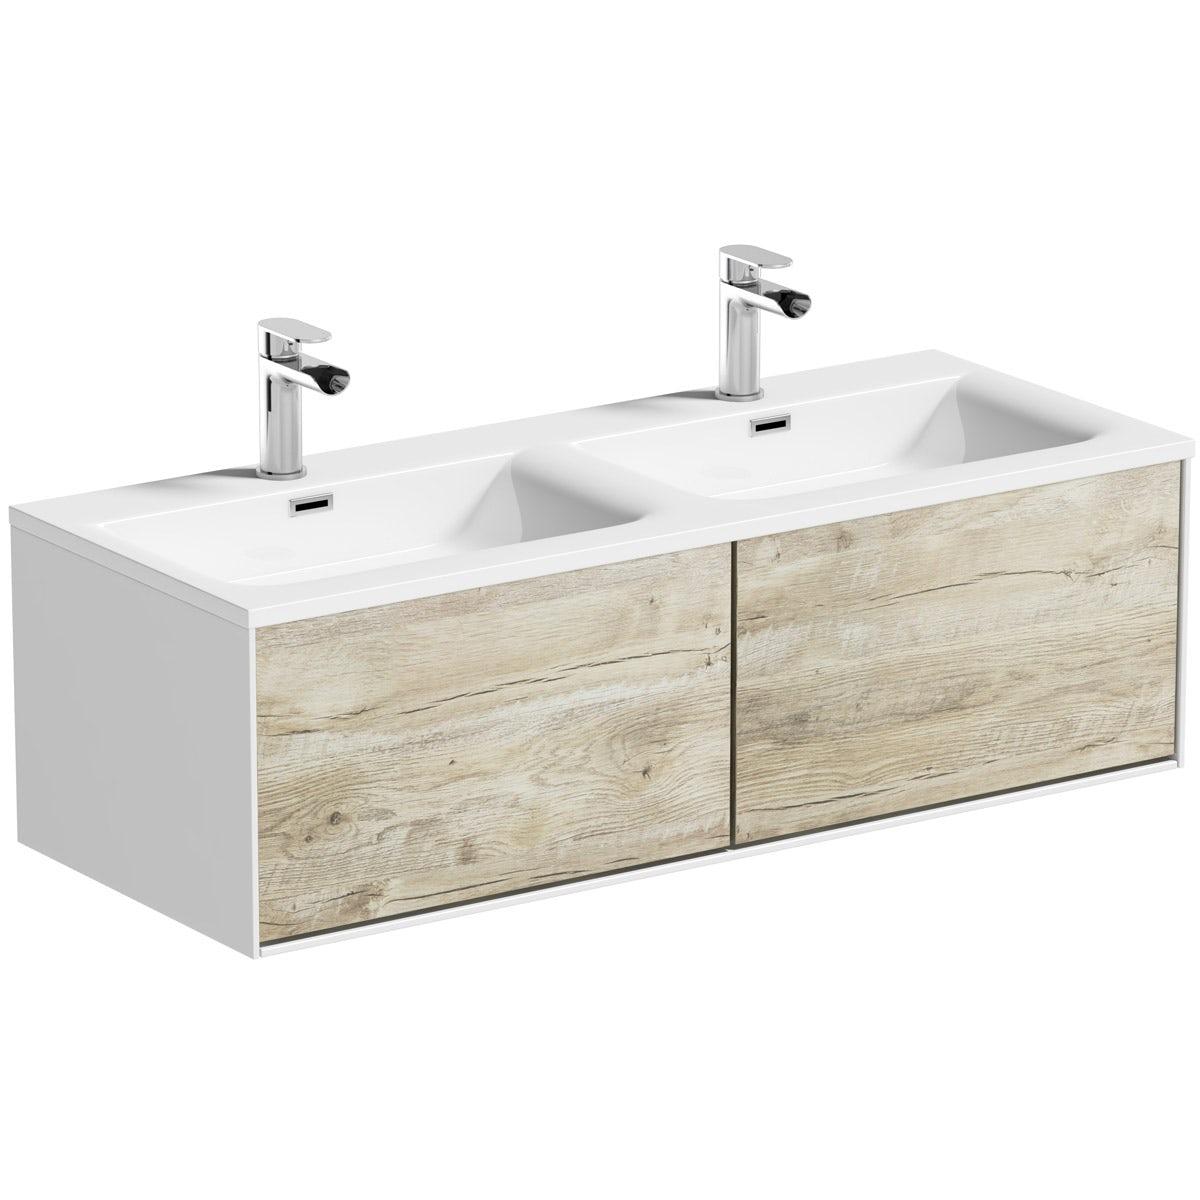 Mode Burton White U0026 Rustic Oak Wall Hung Double Basin Vanity Unit 1200mm